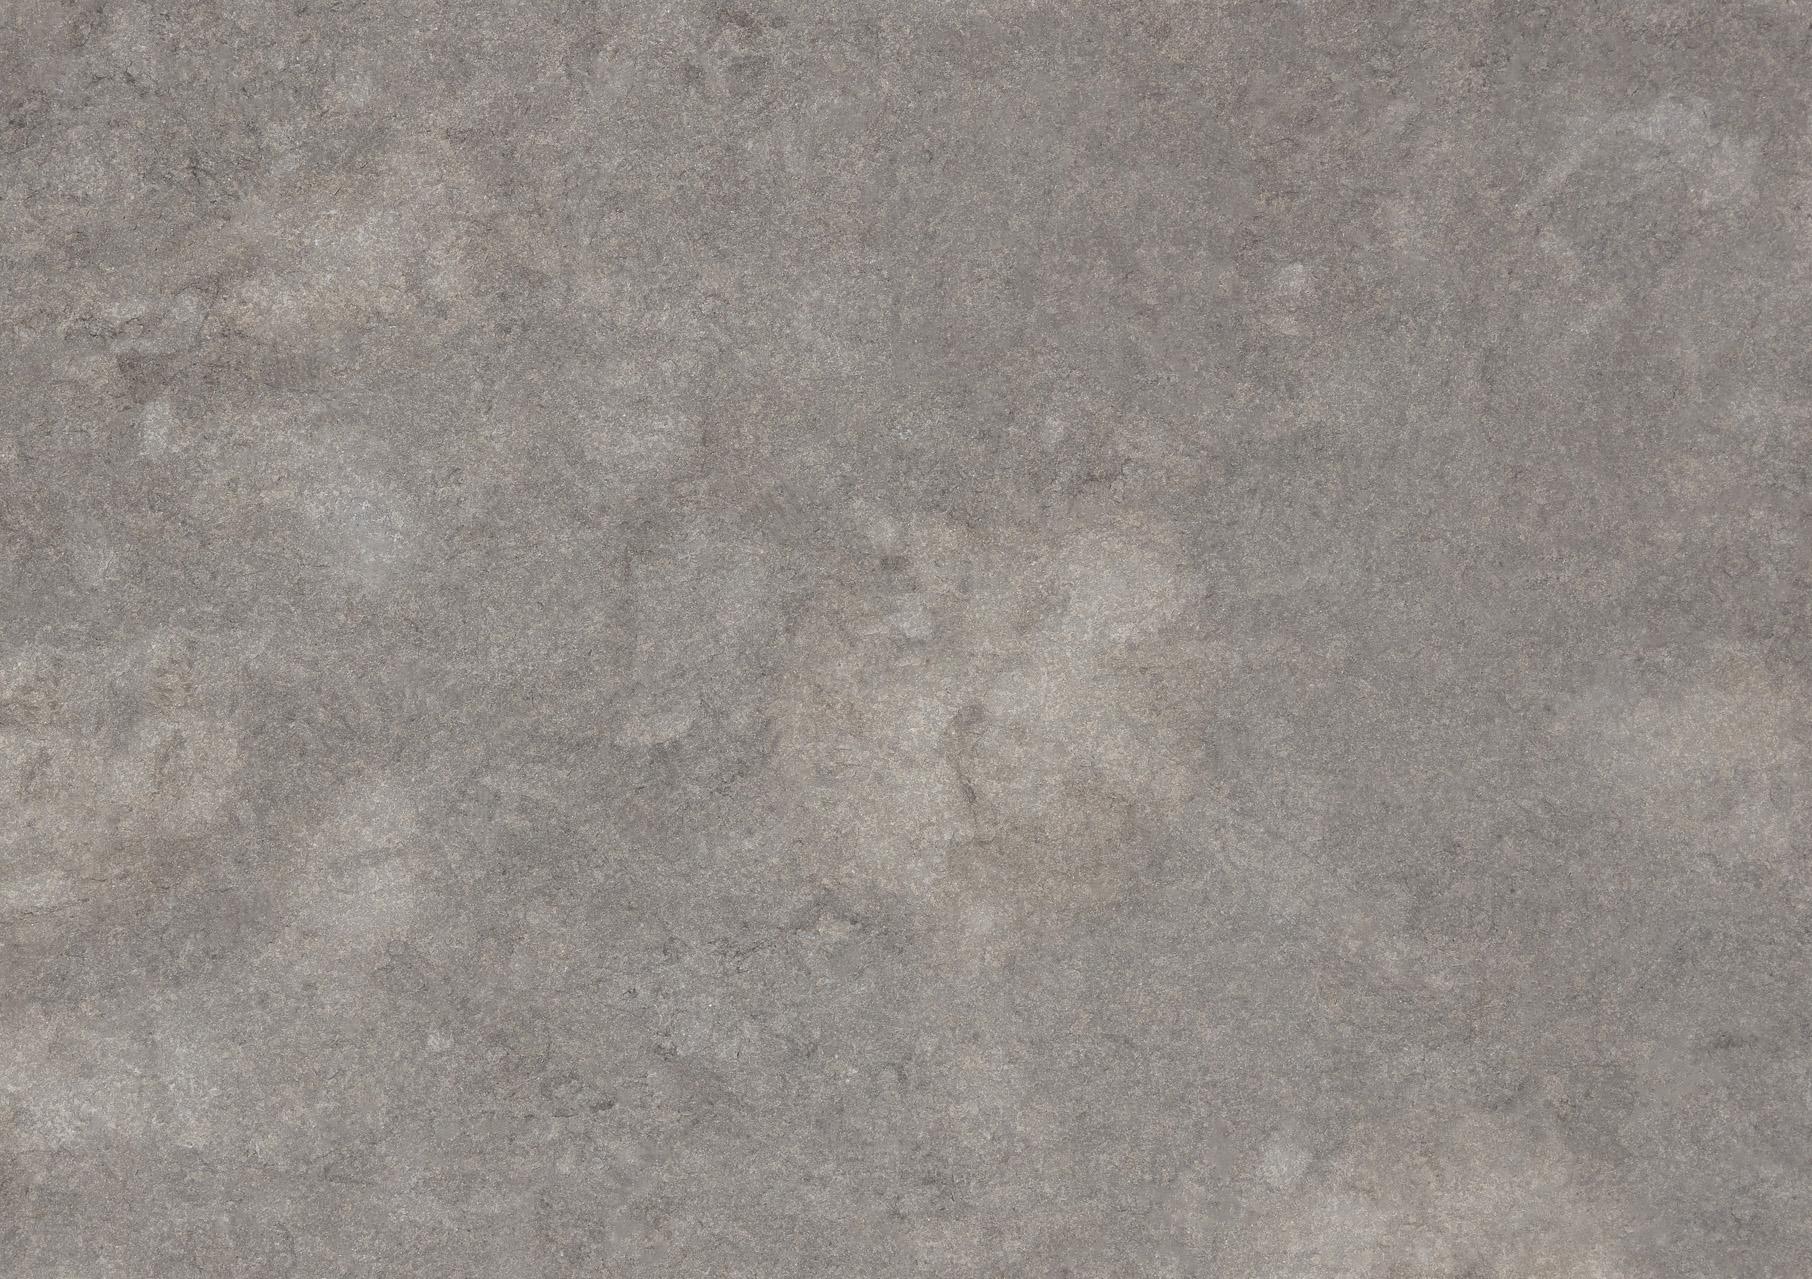 Pietra Bronzea Artedomus